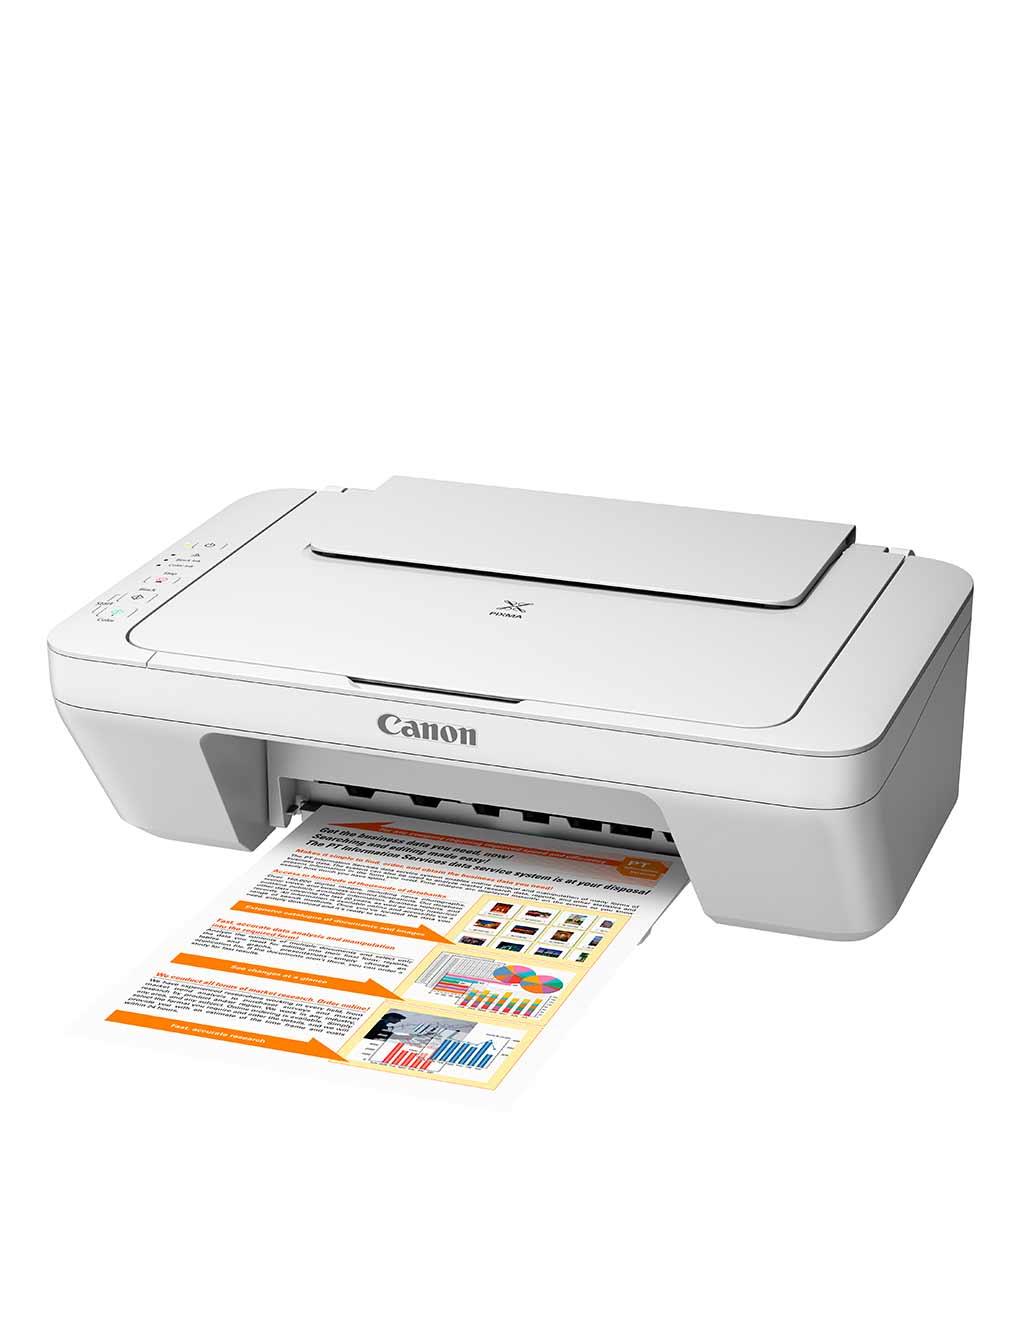 Canon 3 In 1 Color Printer Copier Scanner Buy Online At Best